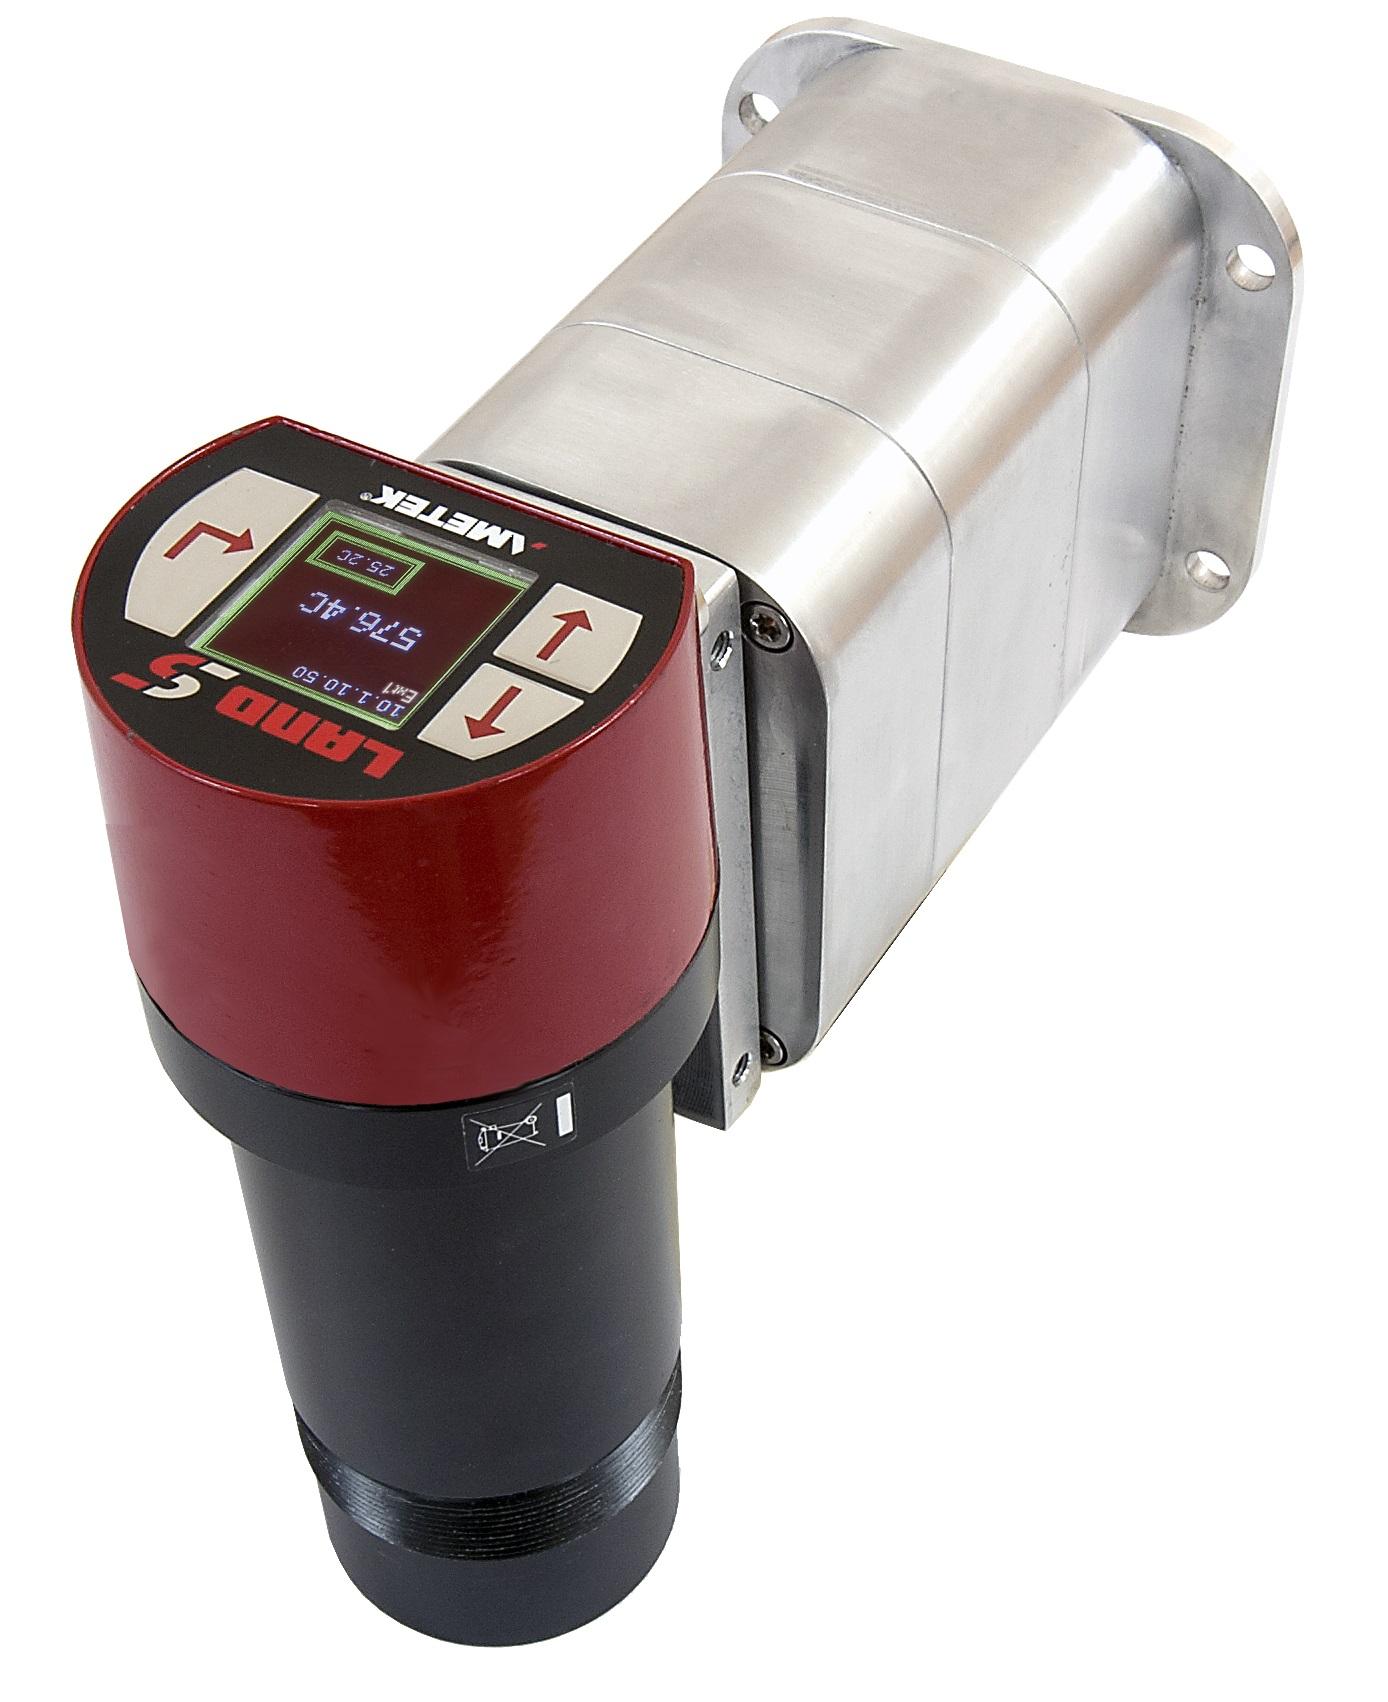 SPOT AL EQS pyrometer with actuator.